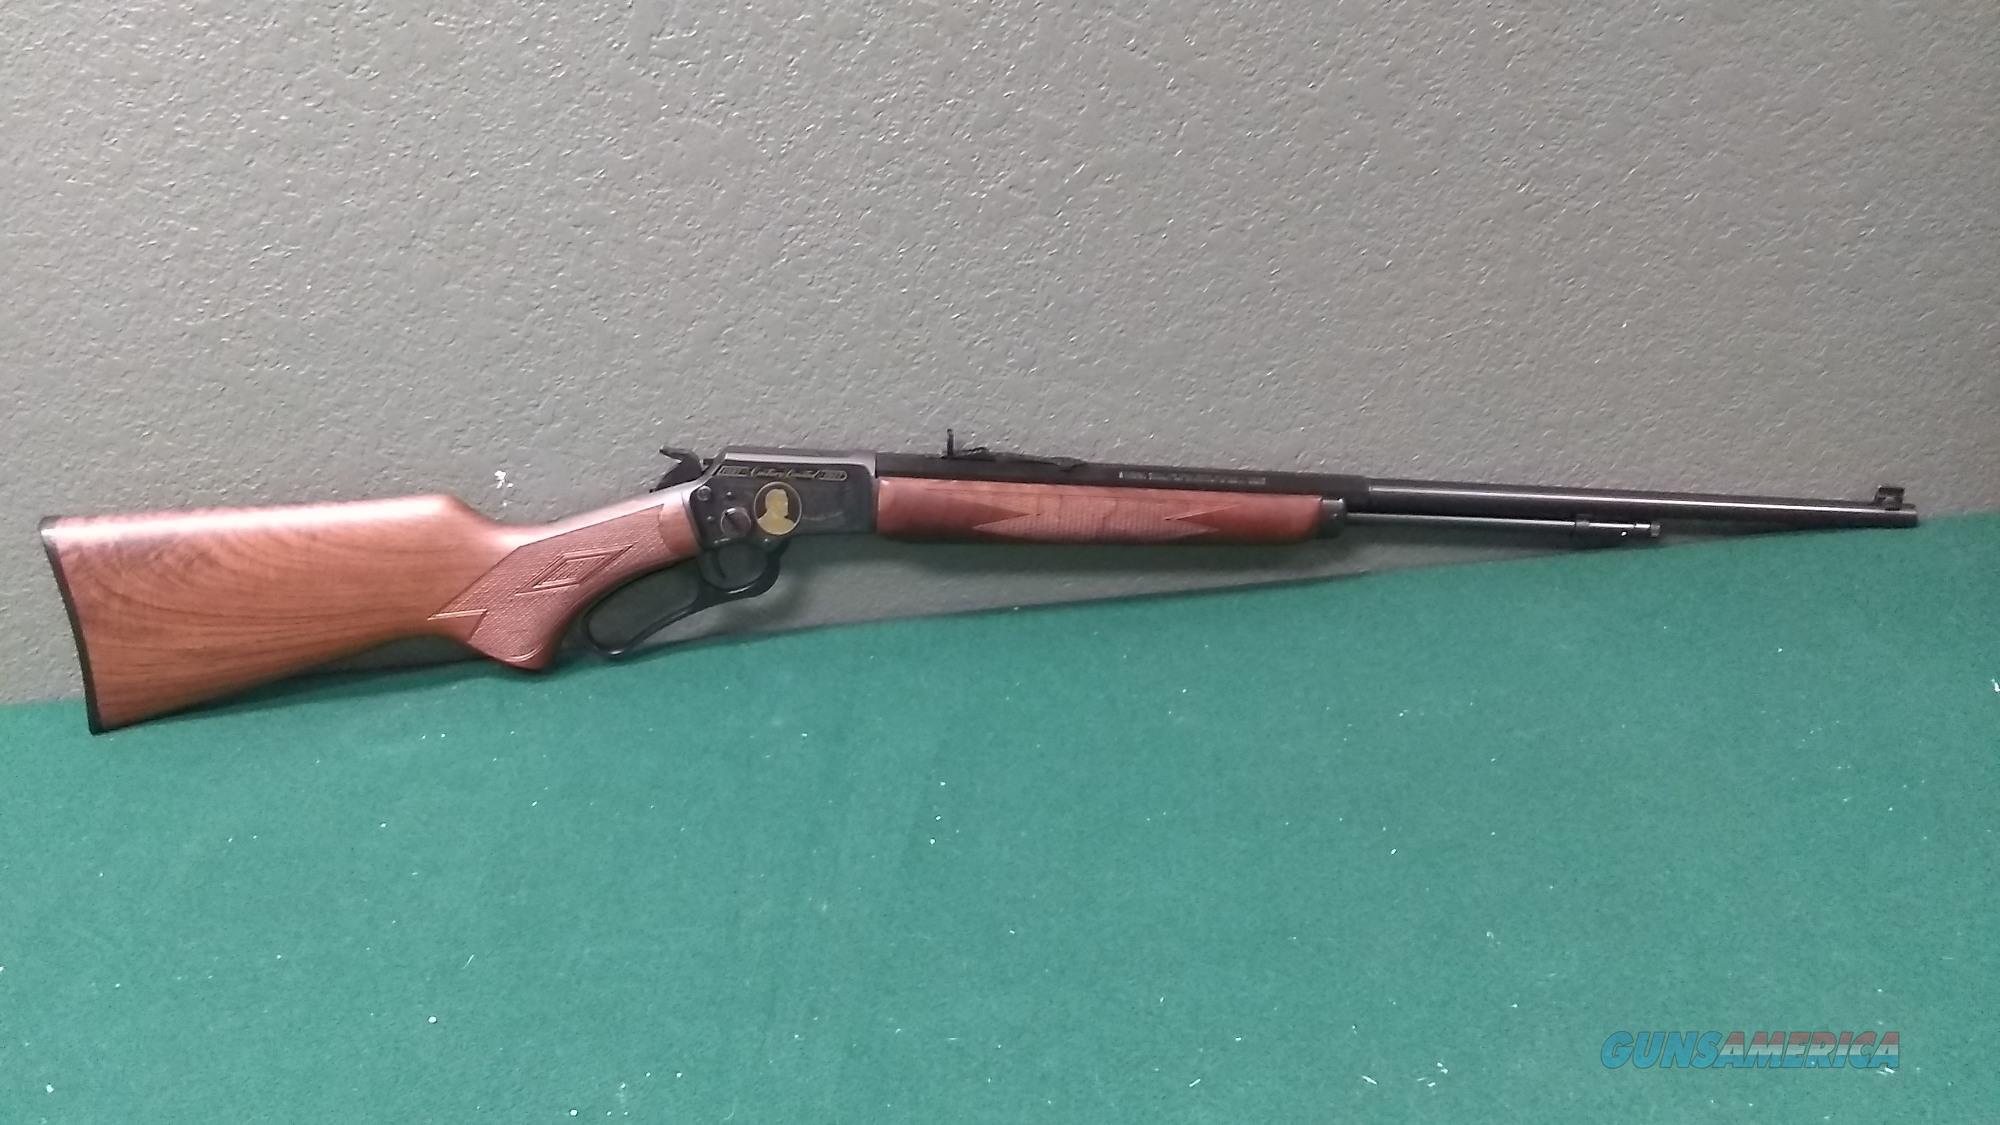 "Marlin 1897CL Rifle  - .22LR - 24"" Barrel - Marlin Century Limited Gun   Guns > Rifles > Marlin Rifles > Modern > Lever Action"